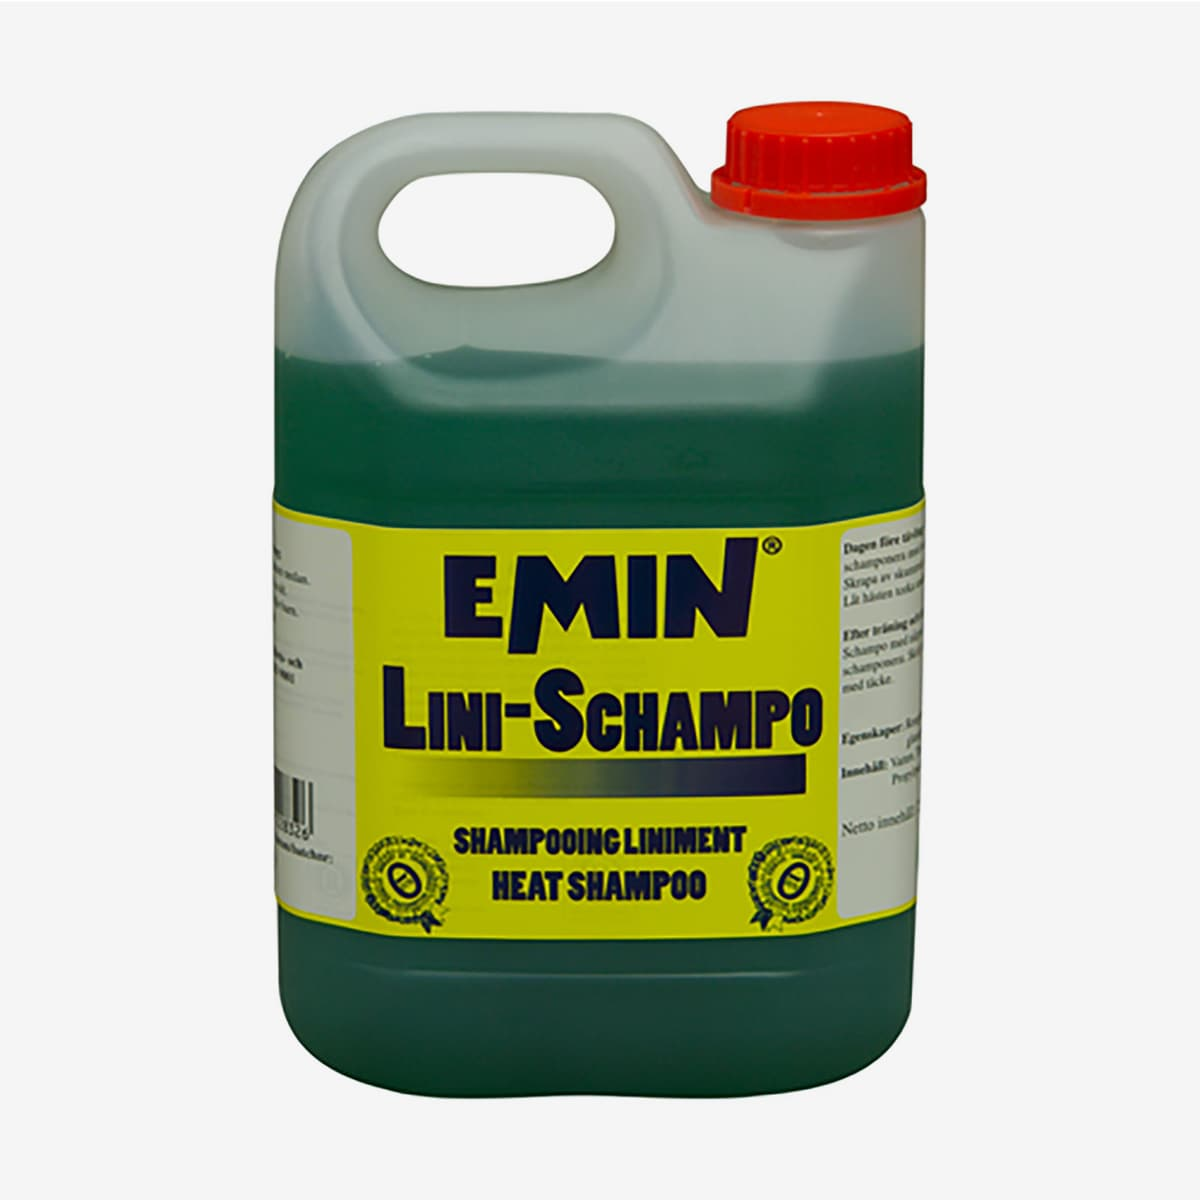 Emin Lini-shampoo, 2500 ml